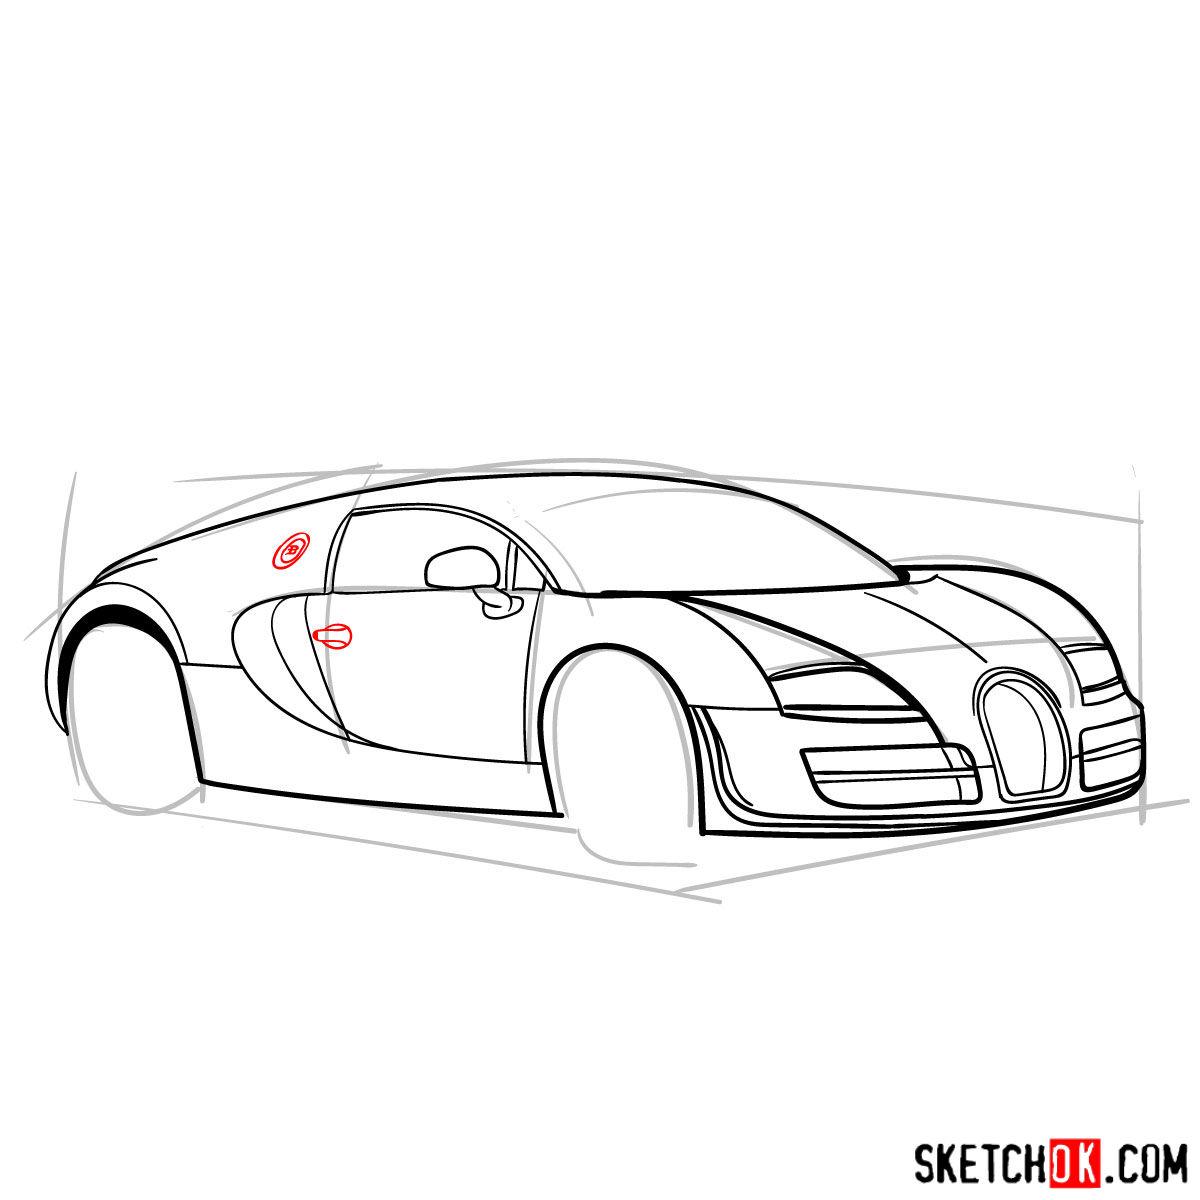 How to draw Bugatti Veyron 16.4 Super Sport - step 09